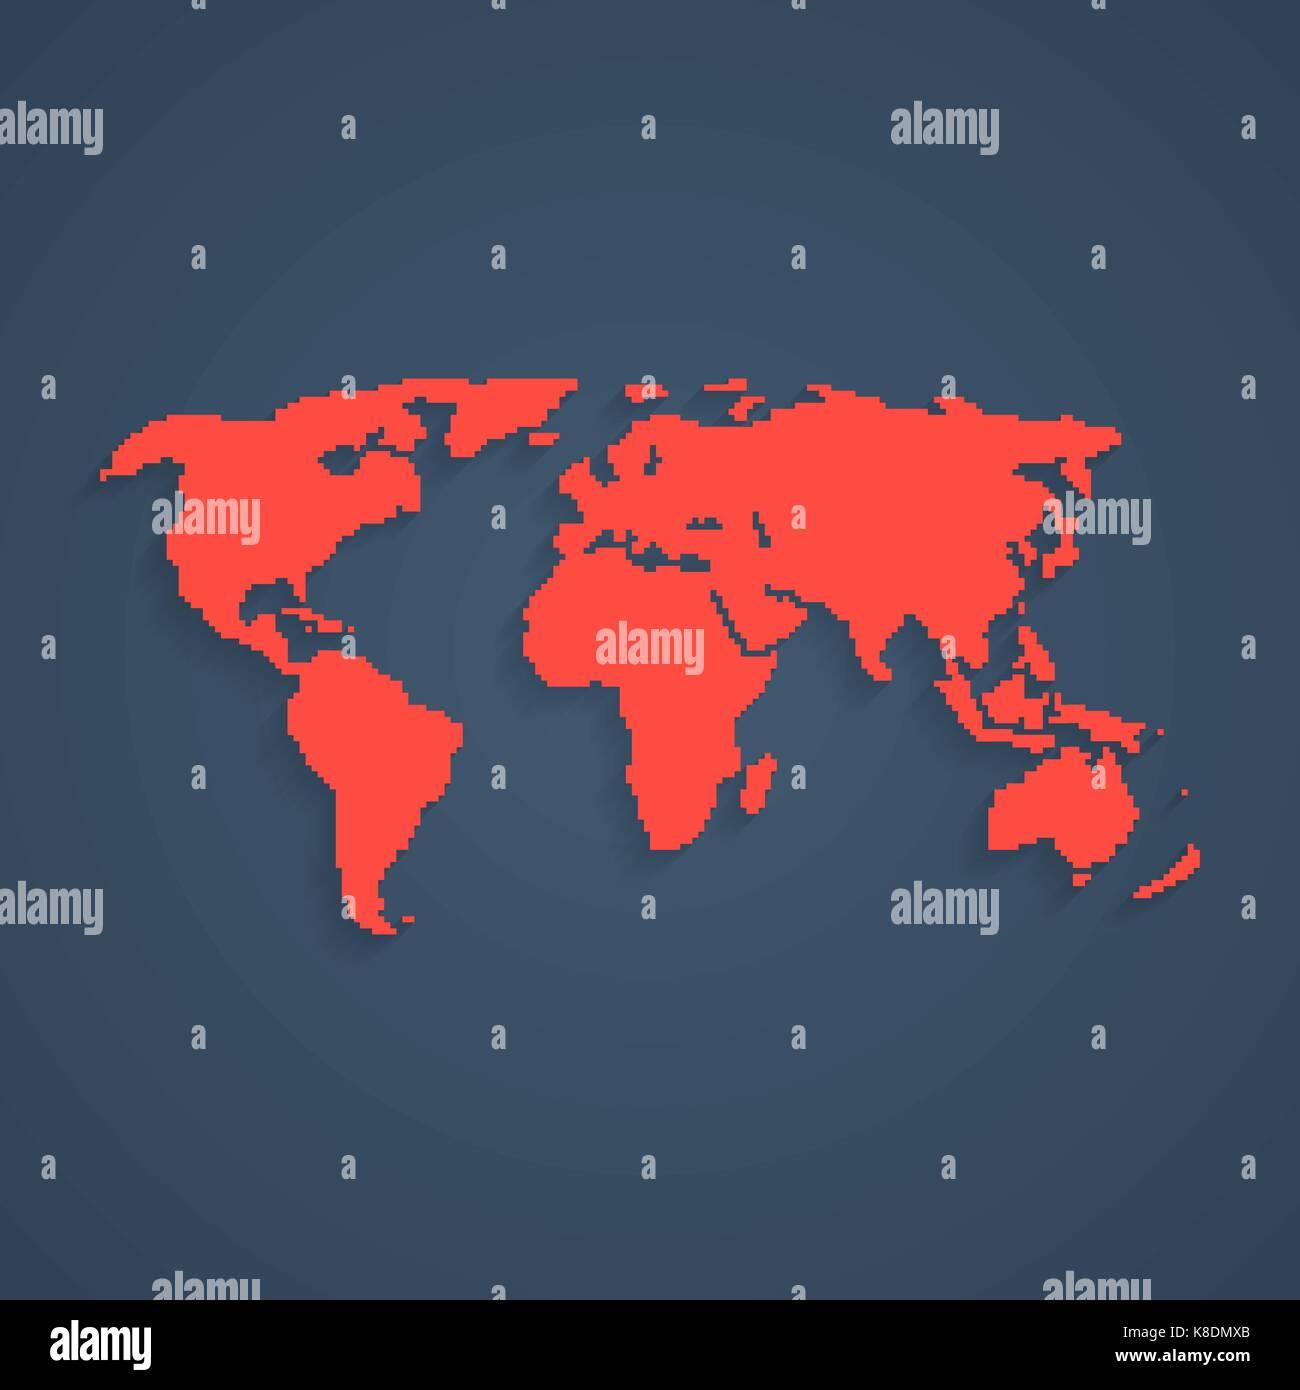 Red pixel art world map stock vector art illustration vector red pixel art world map gumiabroncs Choice Image